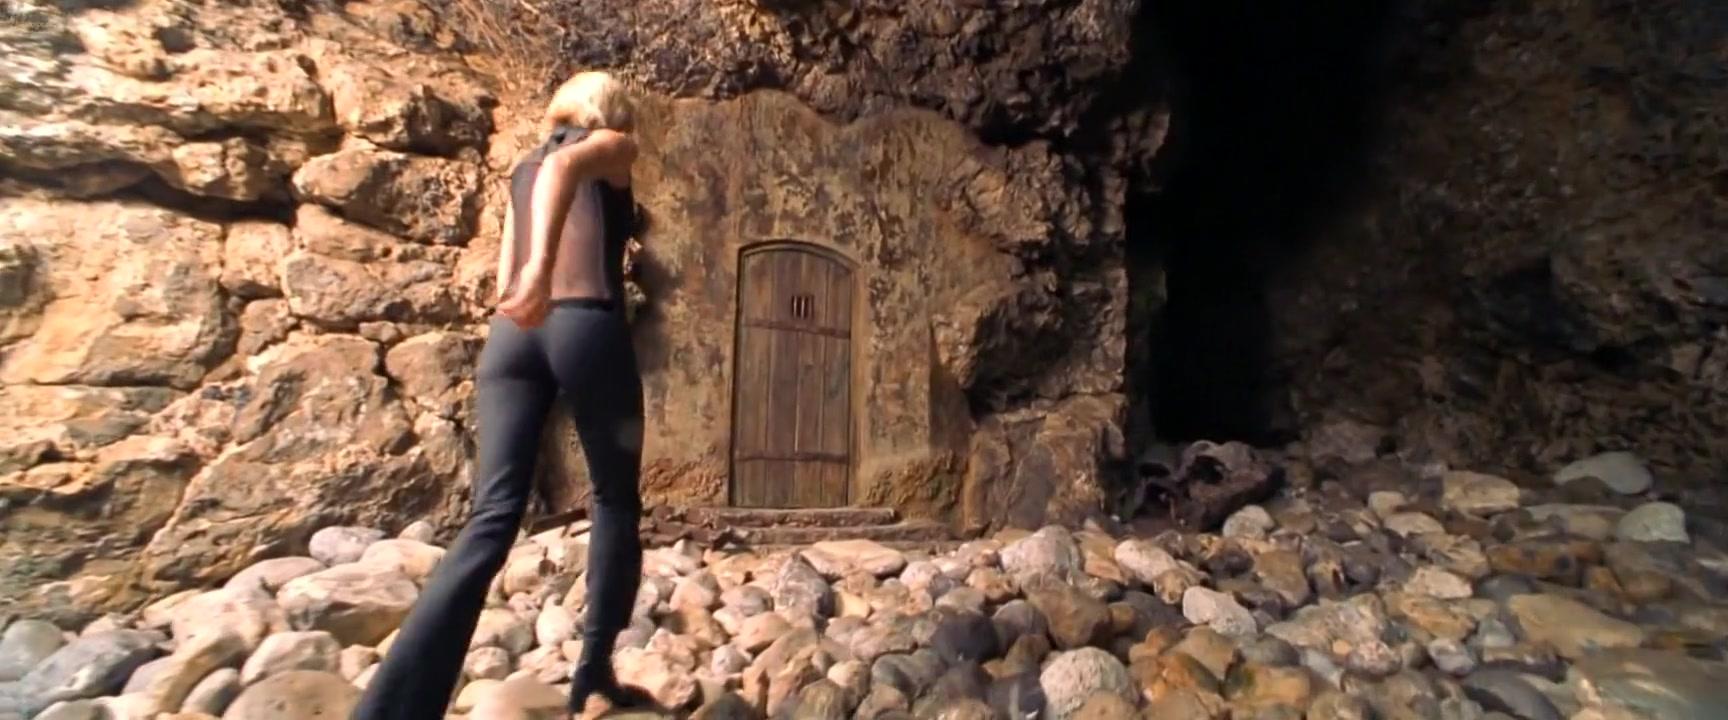 femdom spanks to teaars Pics Gallery